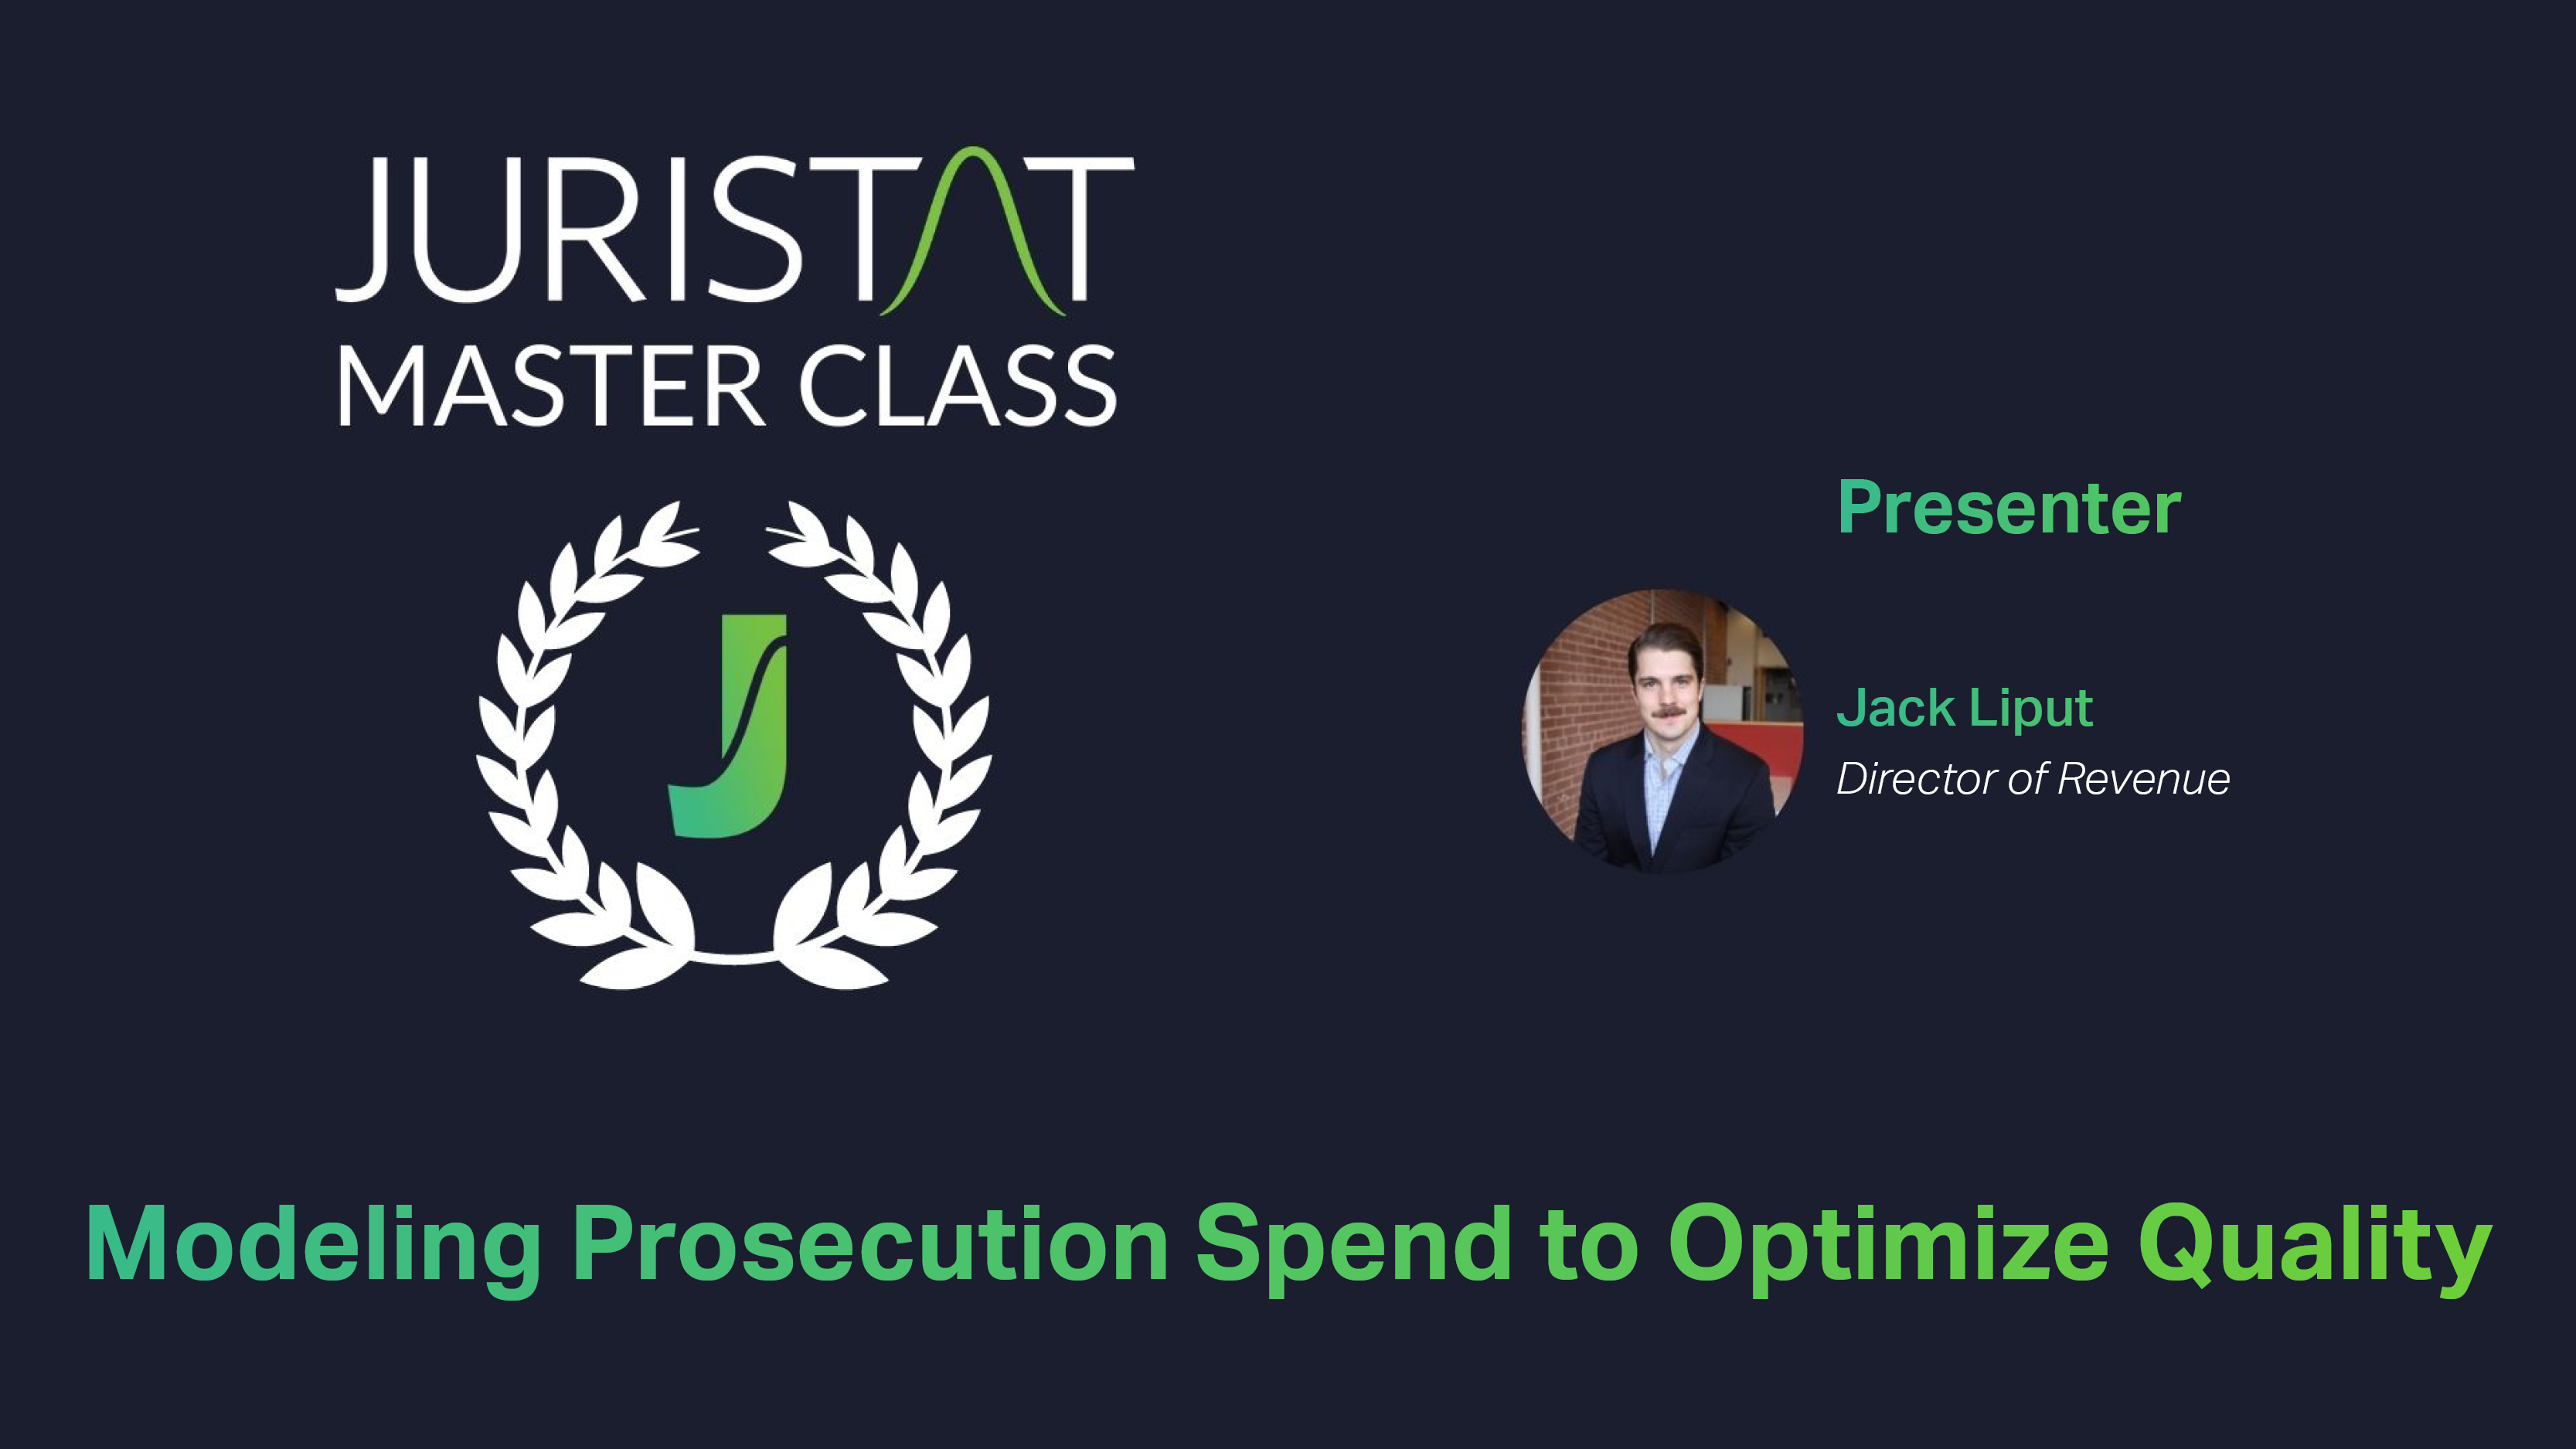 Modeling Prosecution Spend